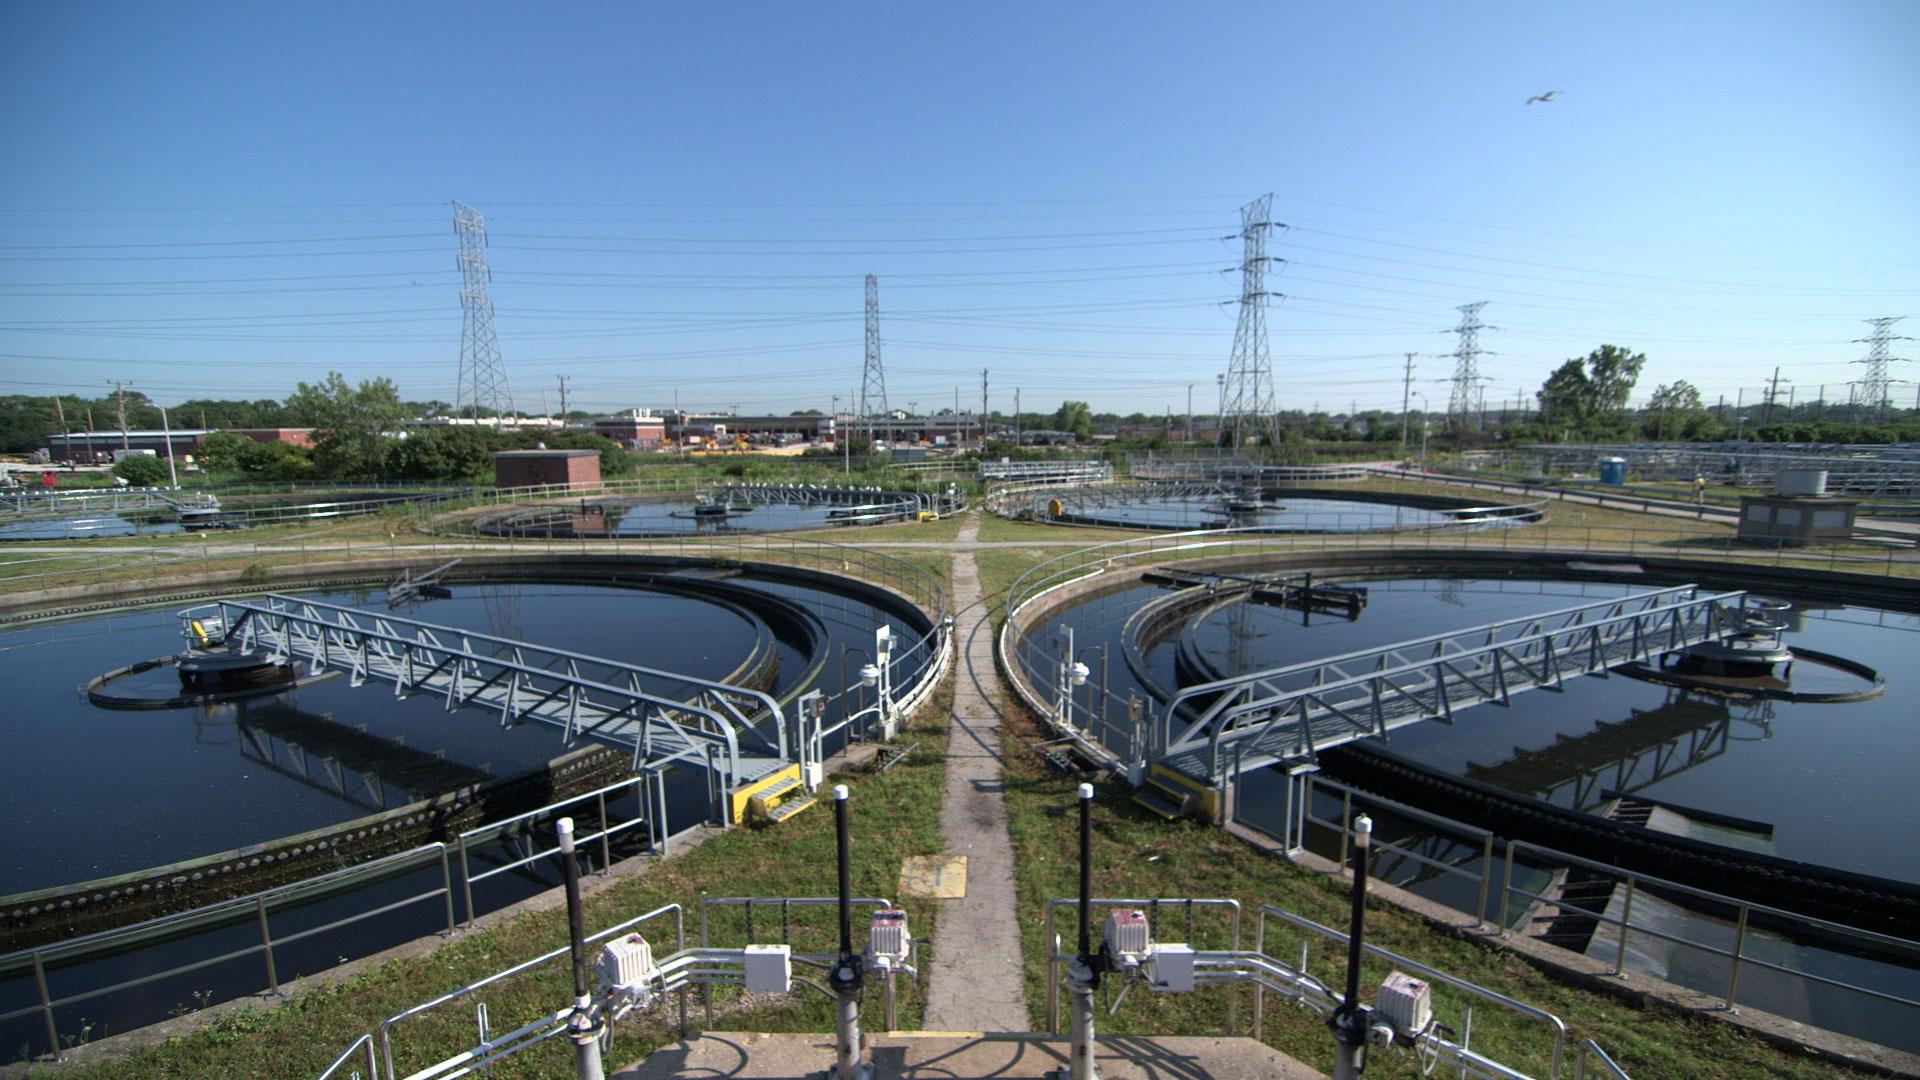 Chicago Metropitan water reclamation